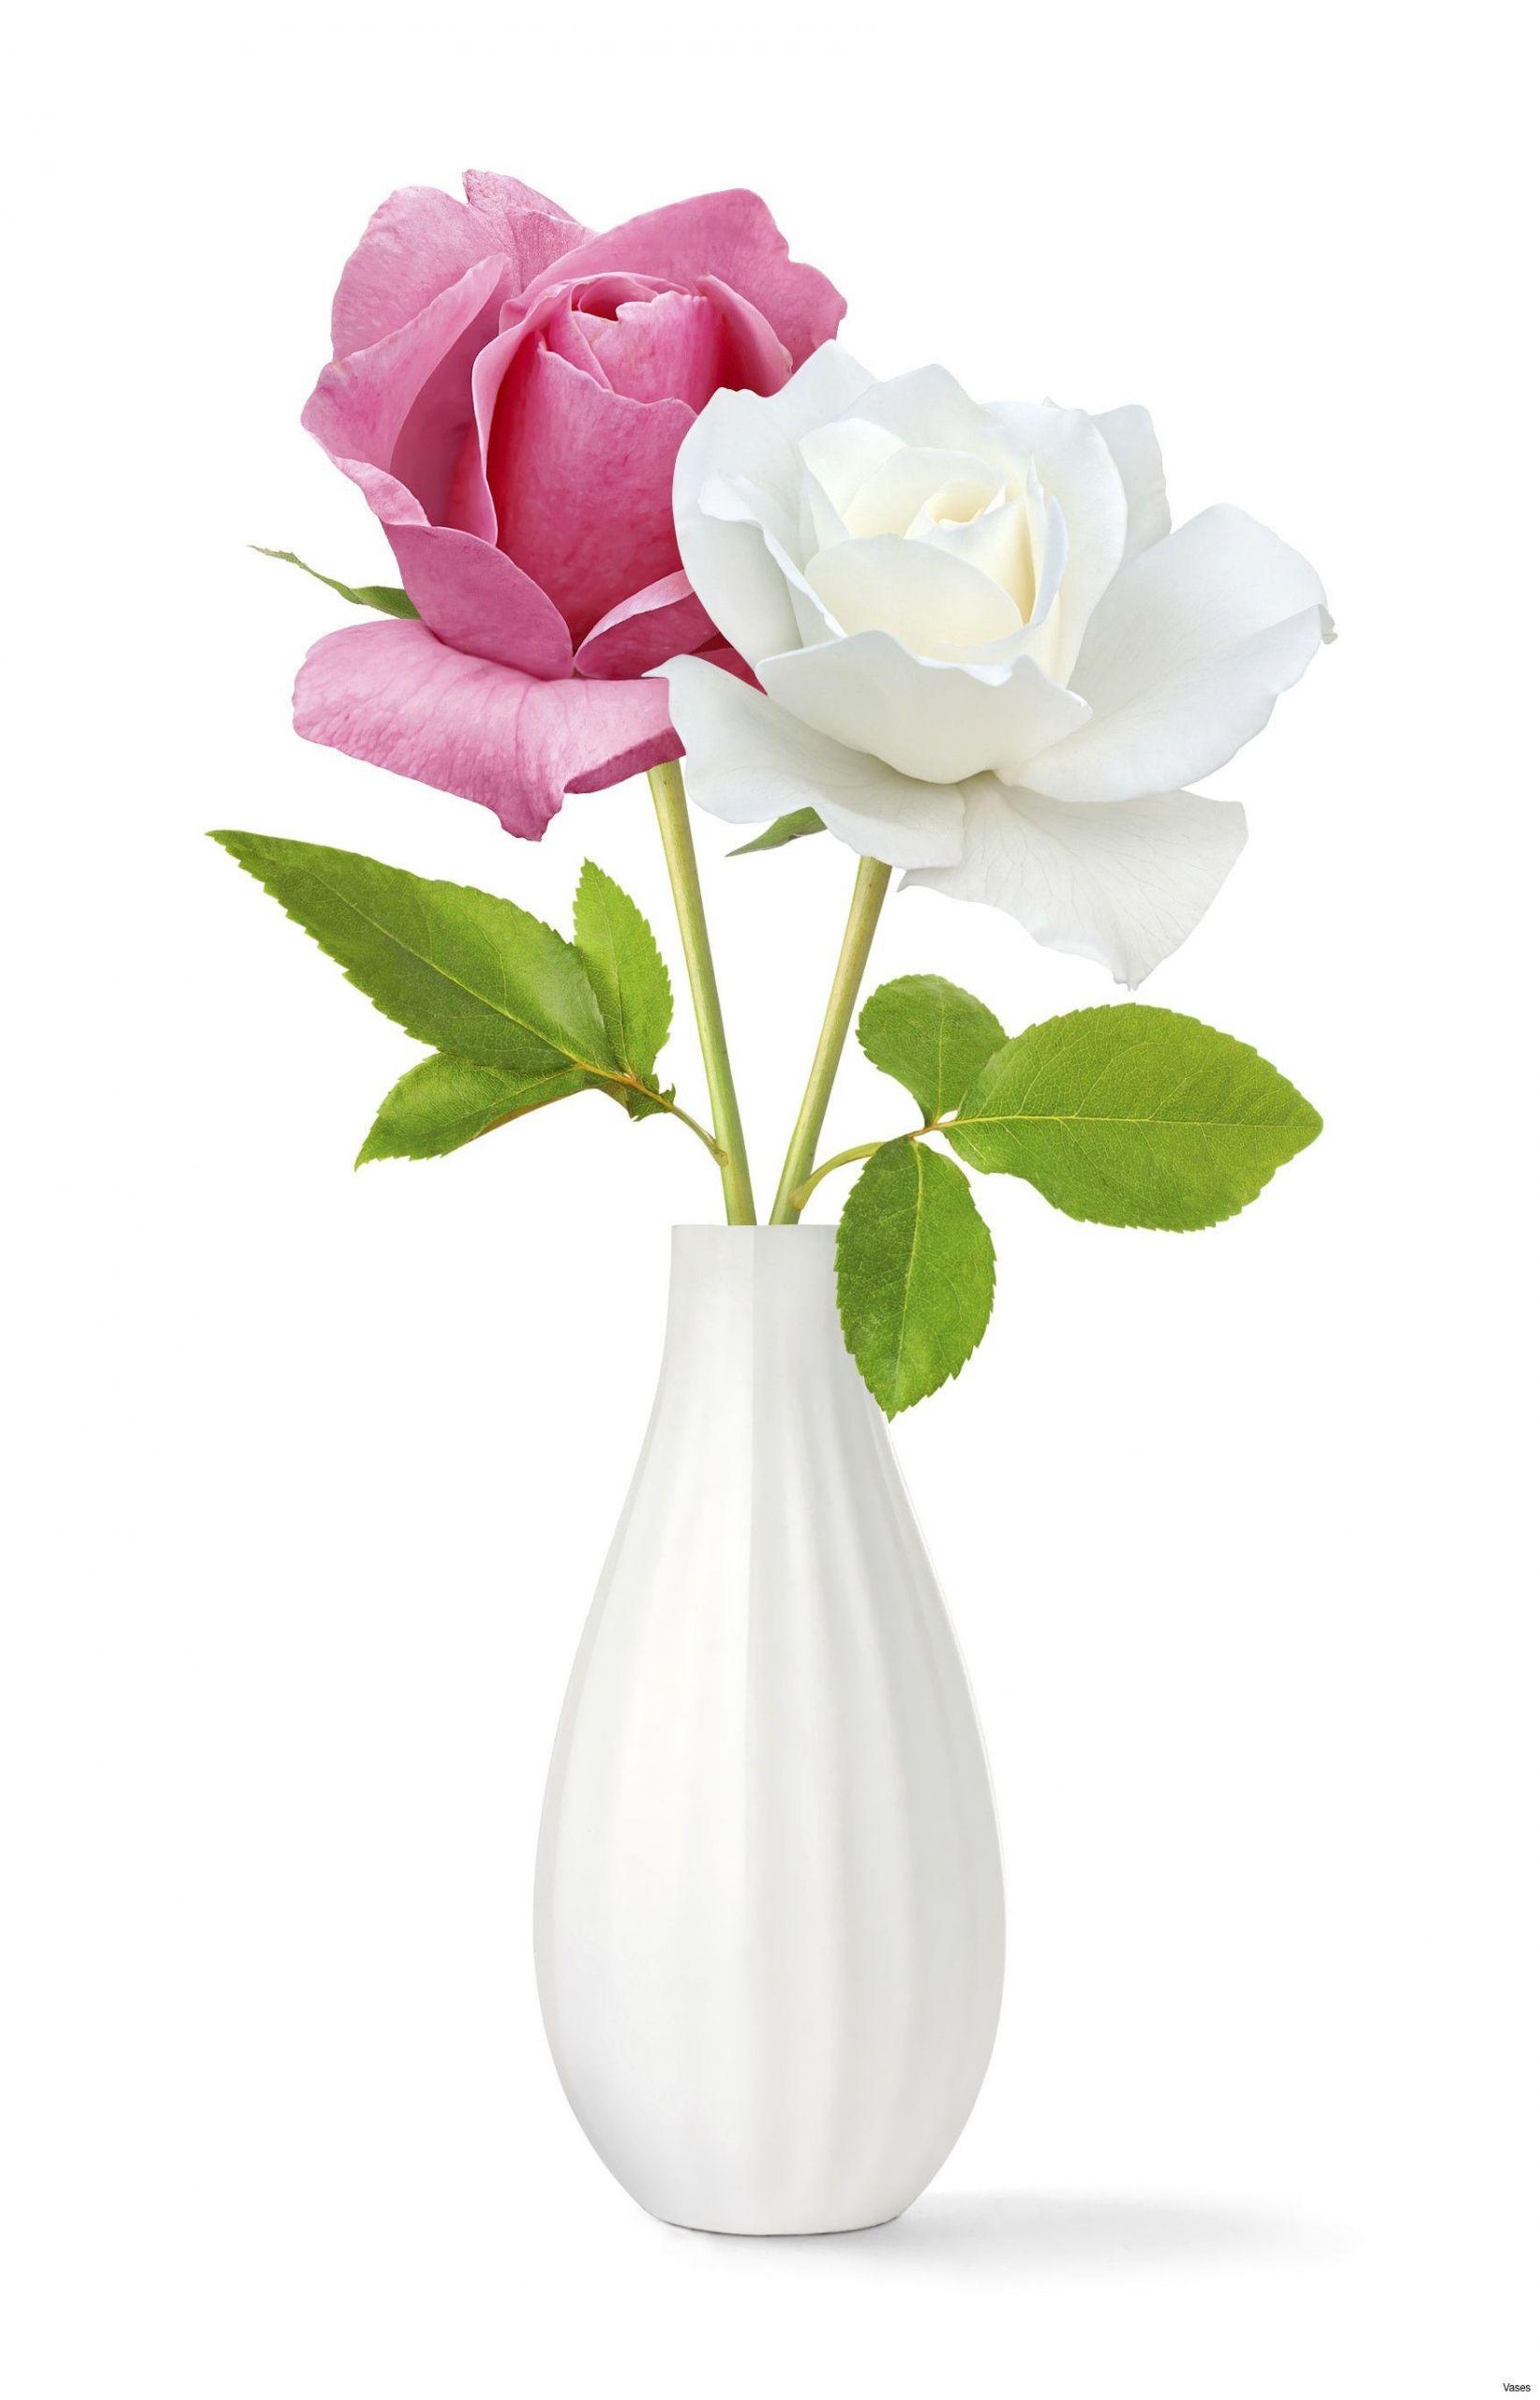 flower vase garden of light pink vase elegant roses red in a vase singleh vases rose within light pink vase elegant roses red in a vase singleh vases rose single i 0d scheme